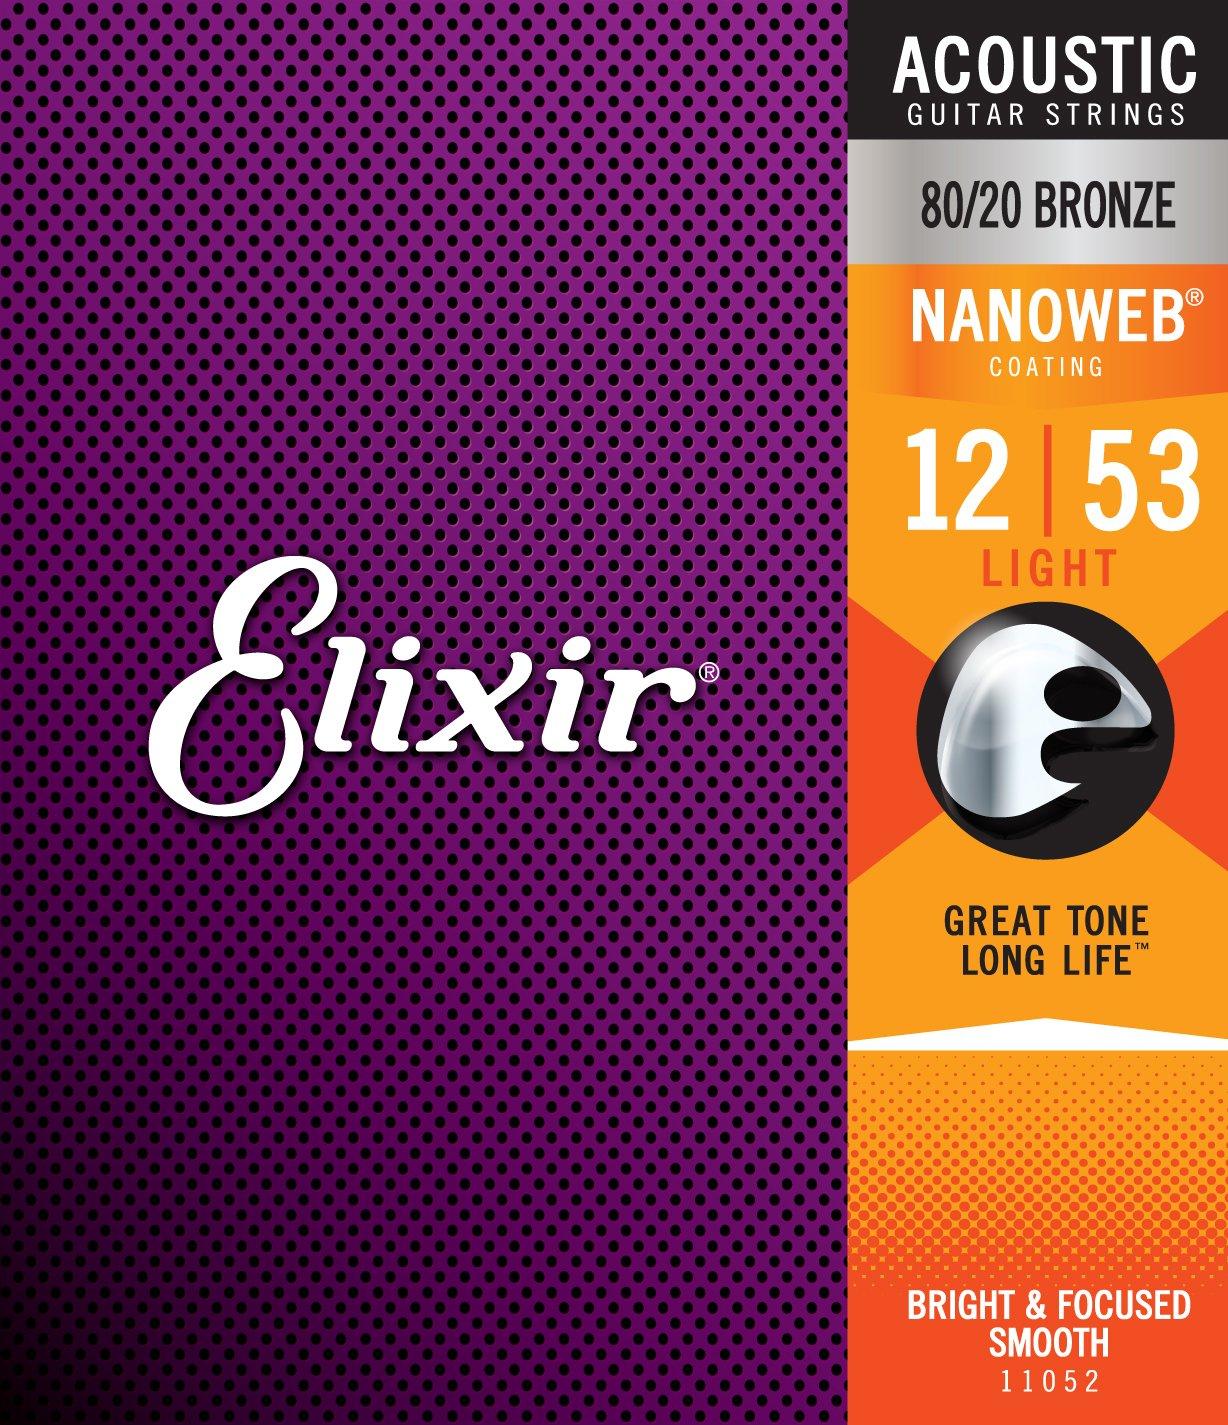 Elixir 80/20 Bronze 11052 Acoustic Guitar Strings, NANOWEB, Light, 12-53